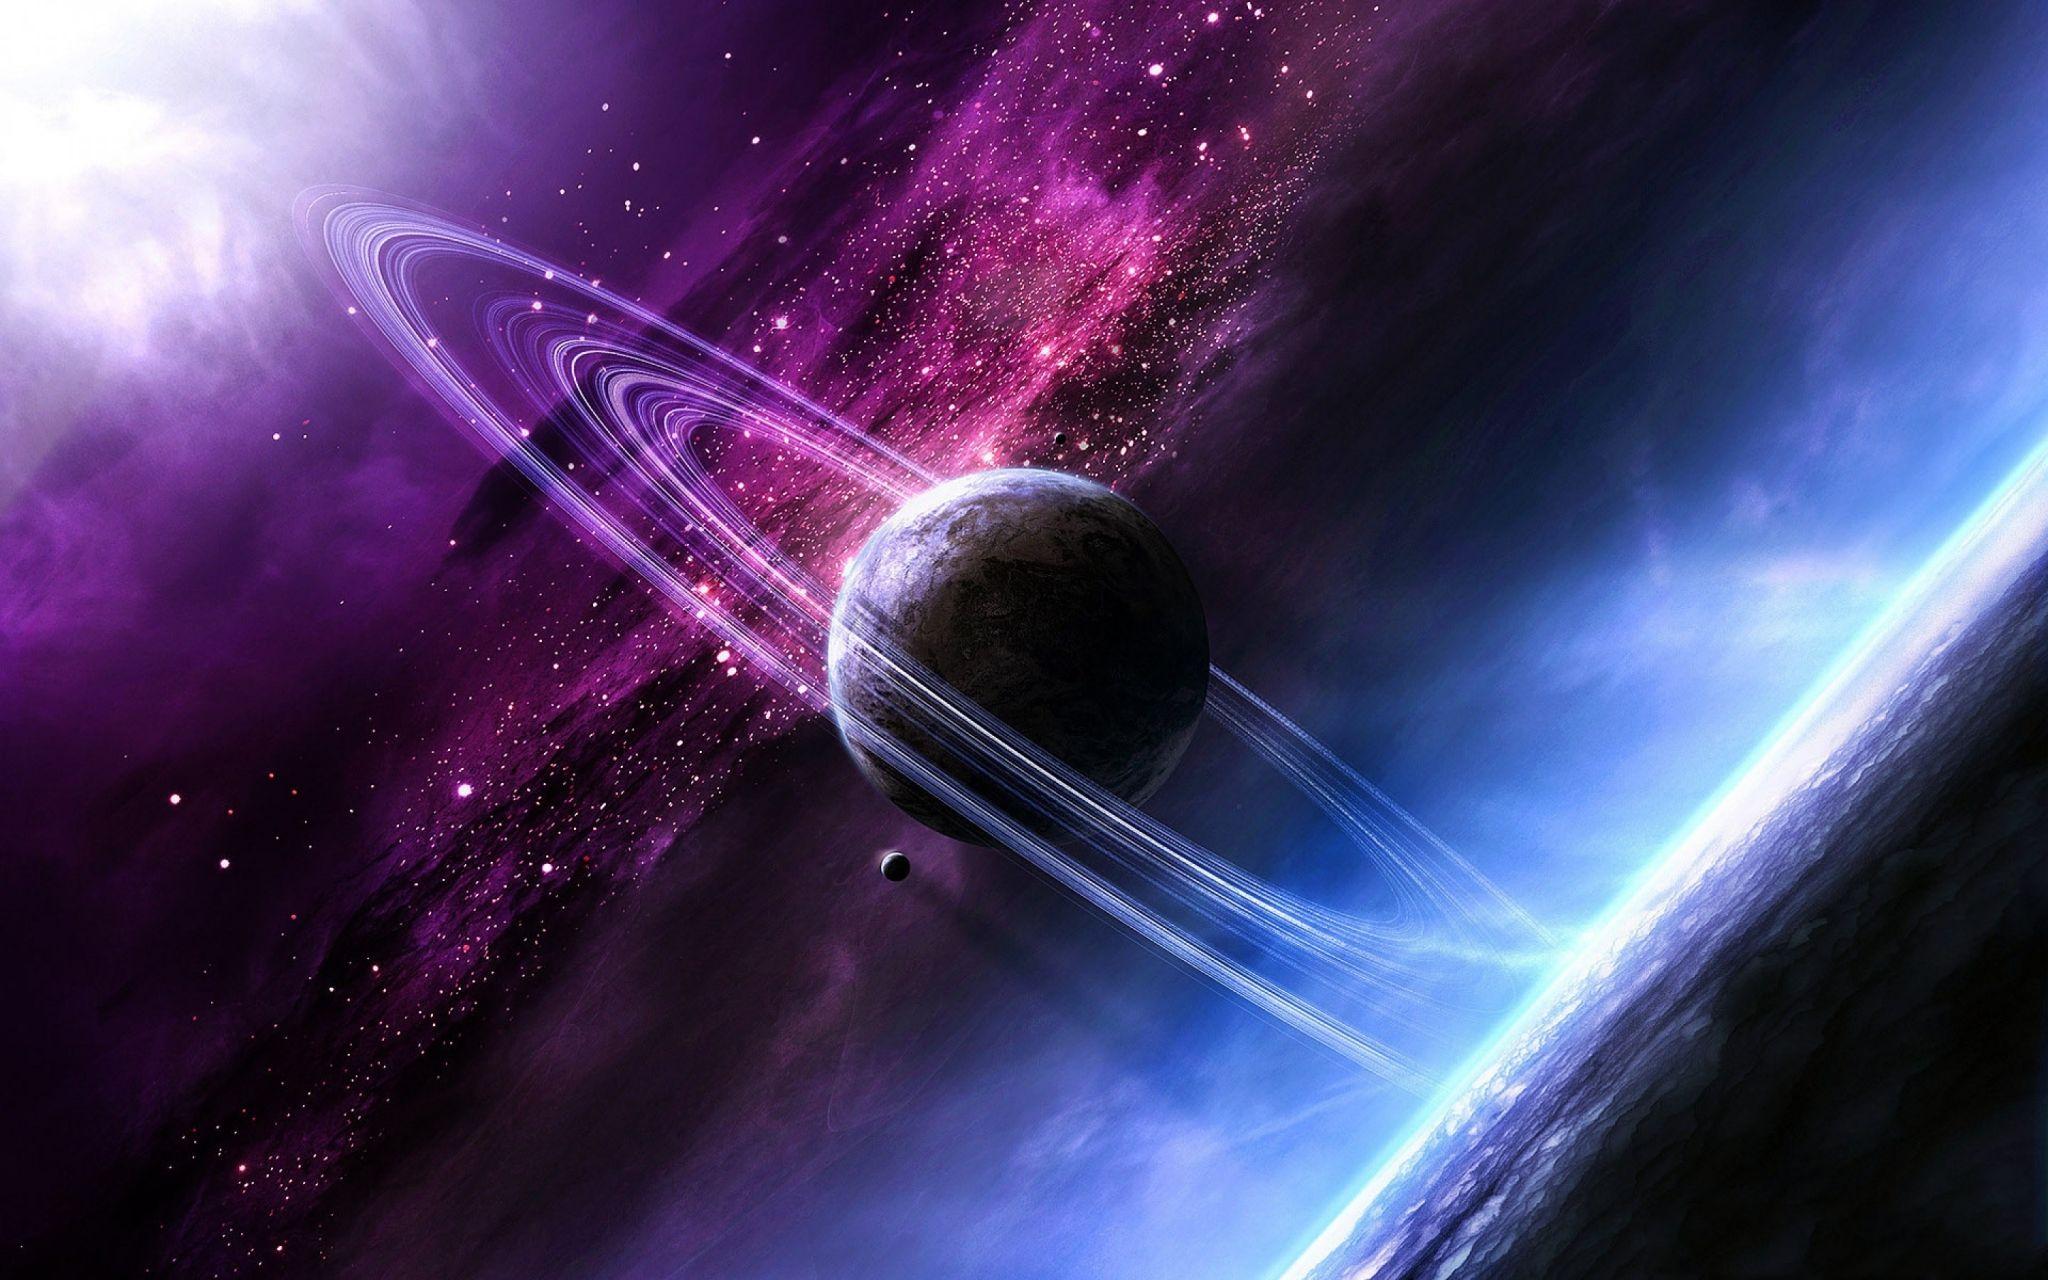 2048x1280 Space Wallpaper Hd Pack Sobre Planetas Saturno Wallpapers Galaxy